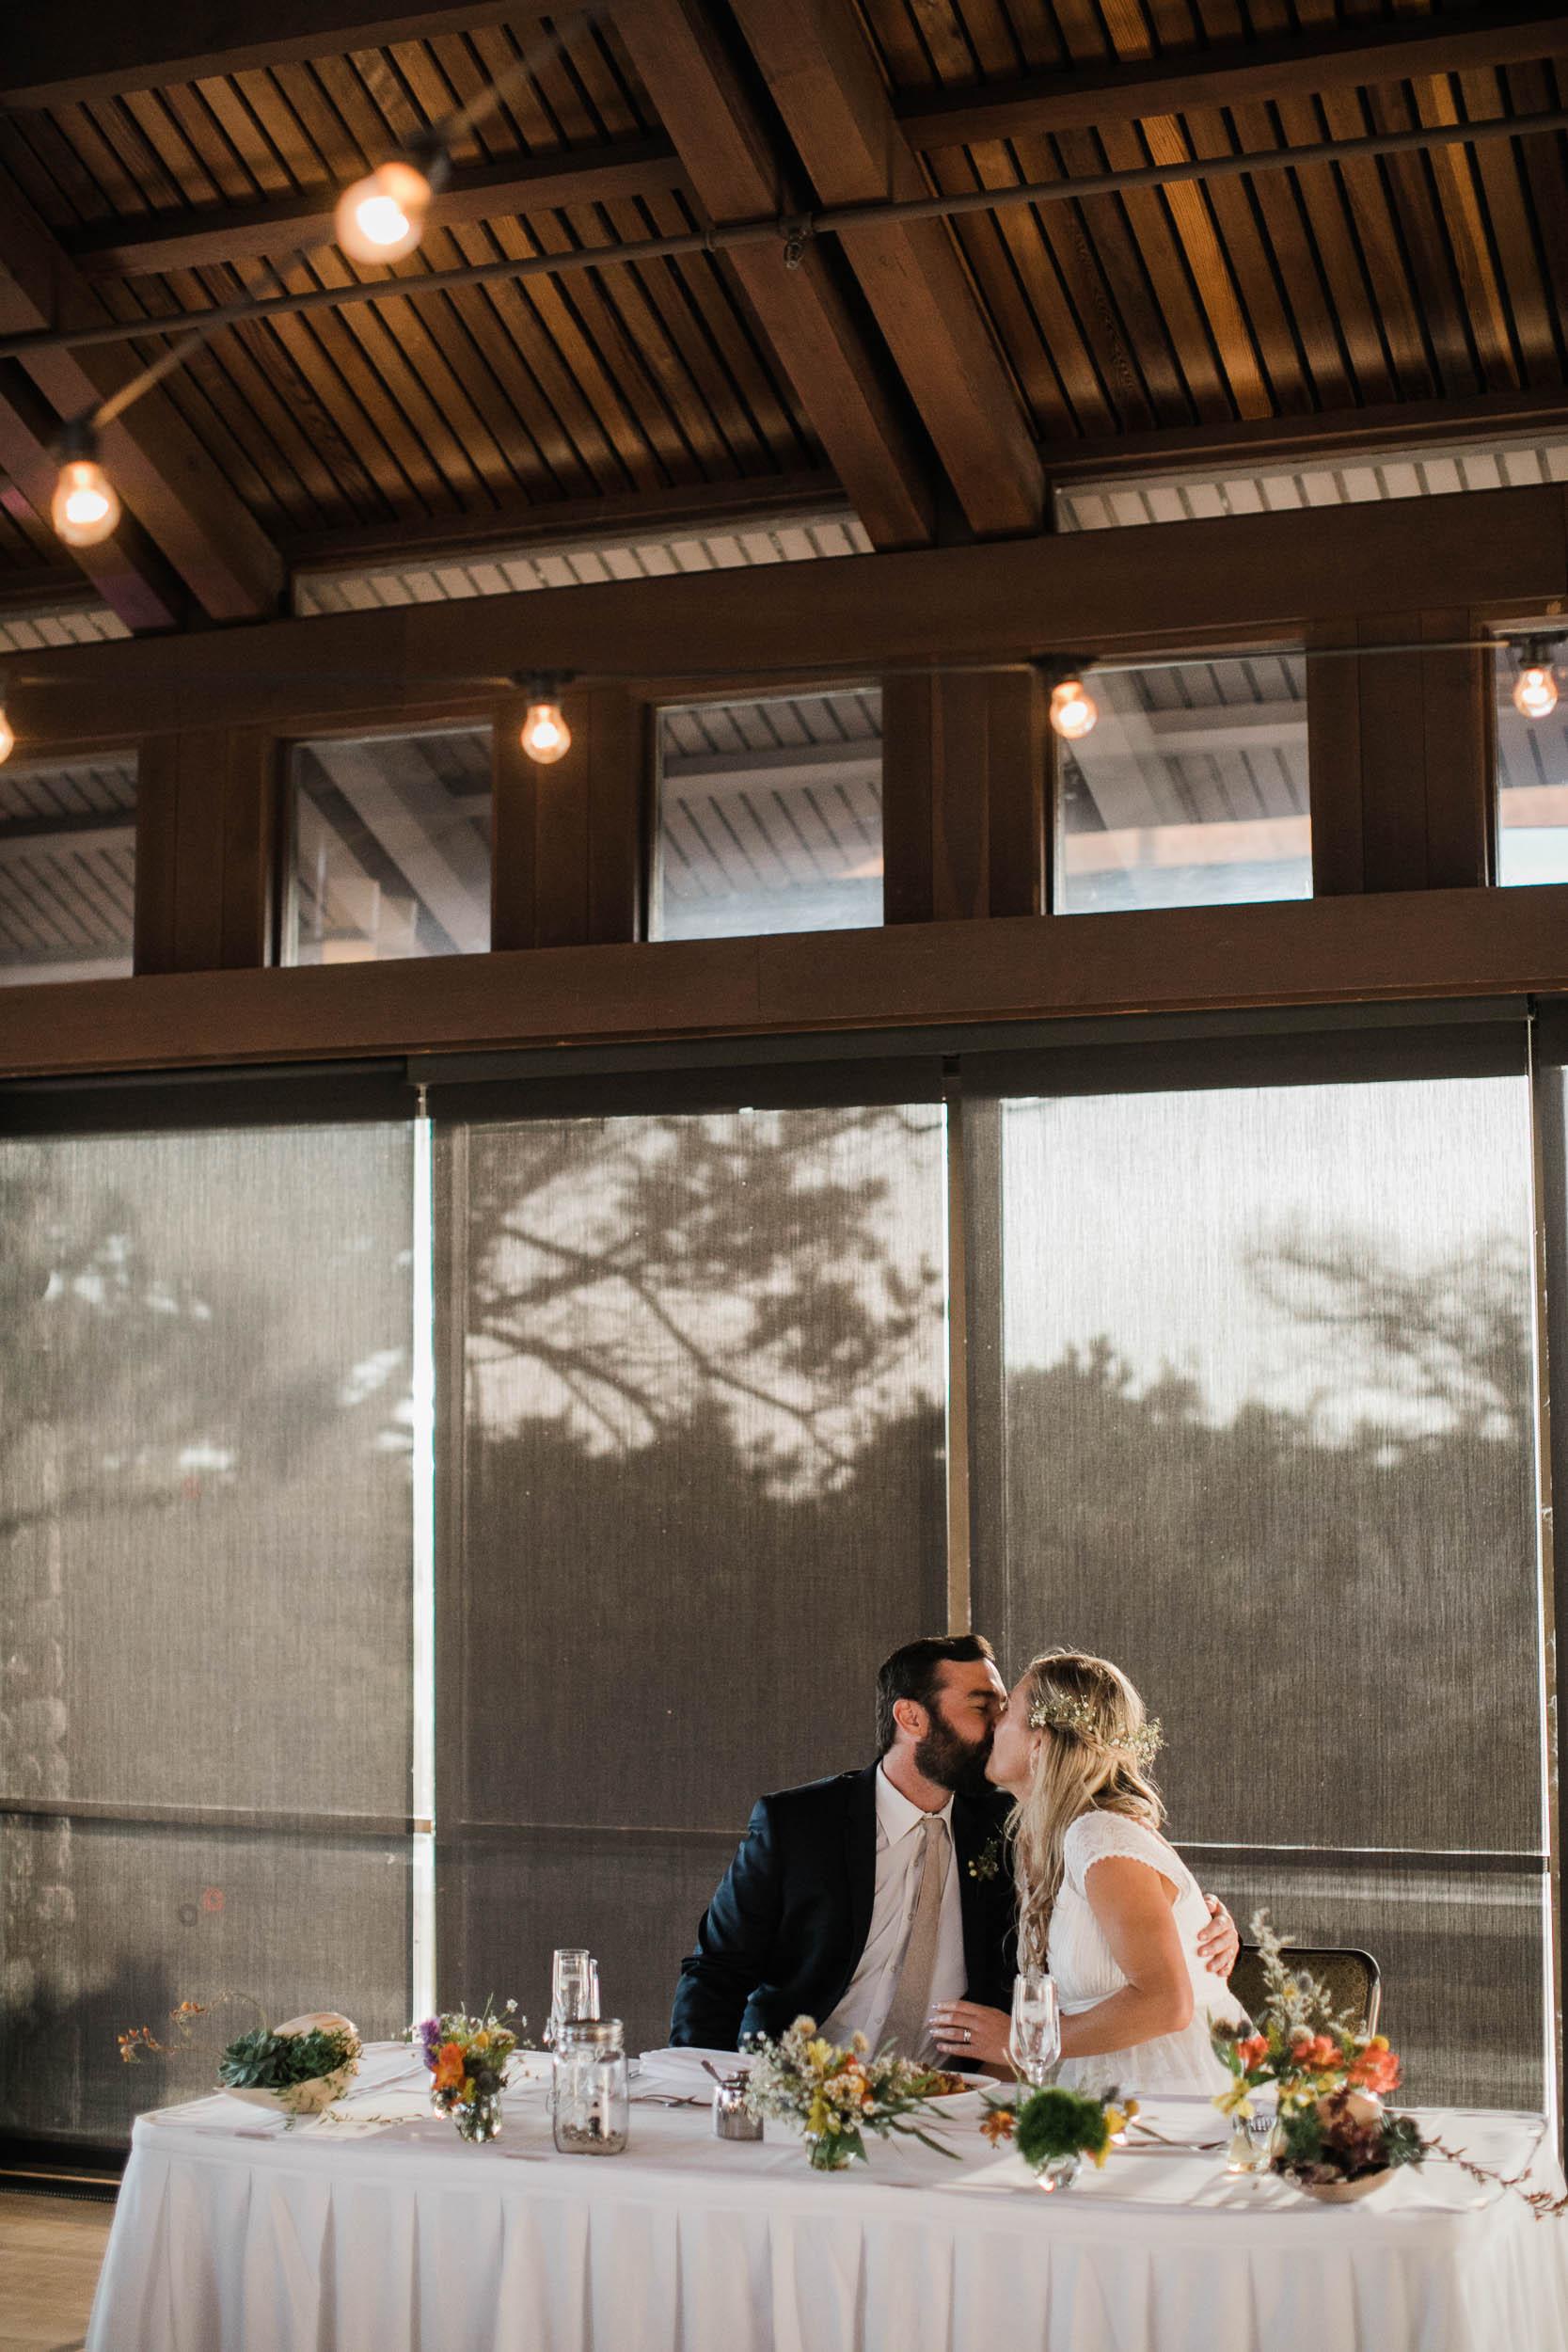 082617_C+K_Asilomar Pacific Grove Wedding_Buena Lane Photography_3001ER.jpg